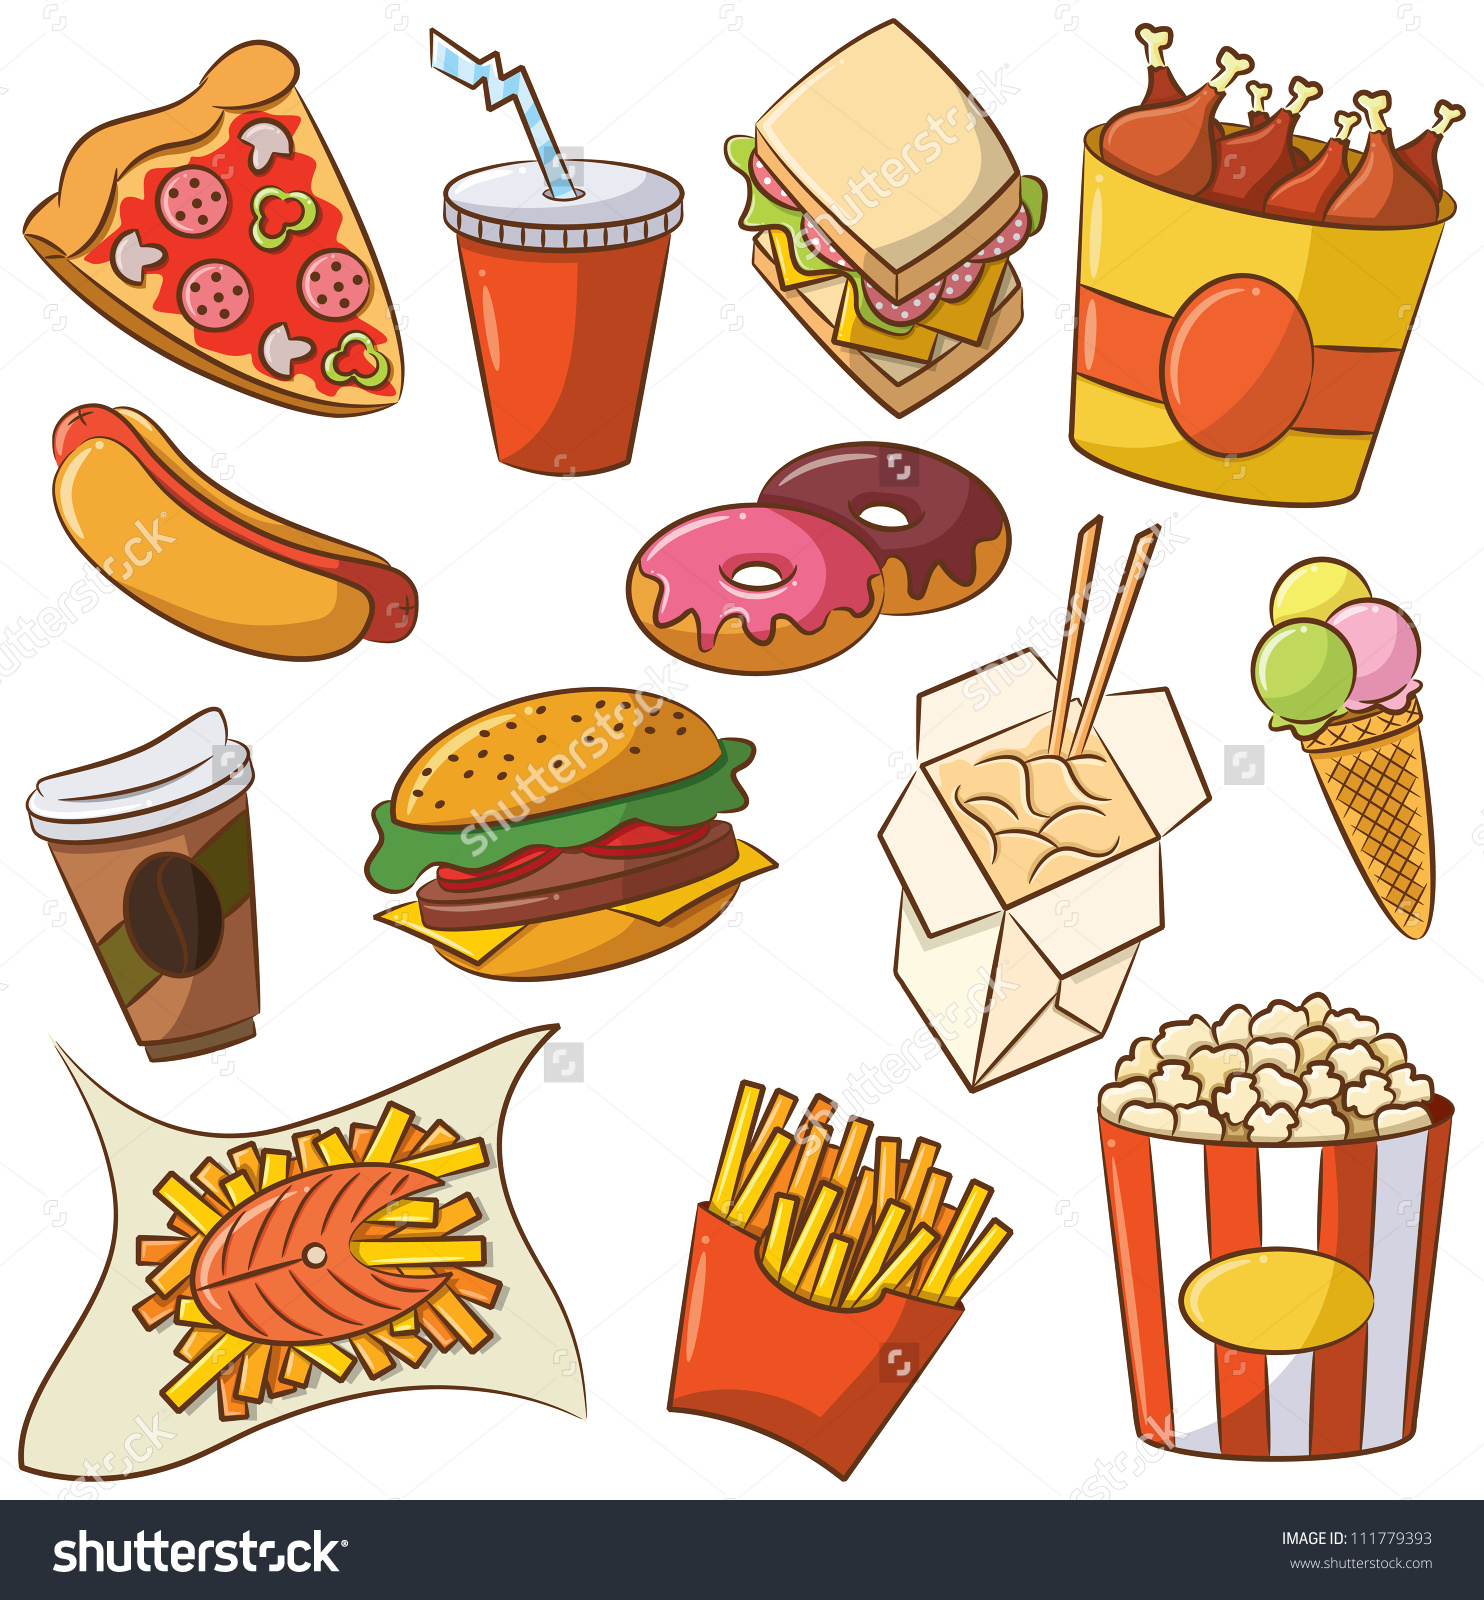 Clipart Of Junk Food - .-Clipart of junk food - .-0